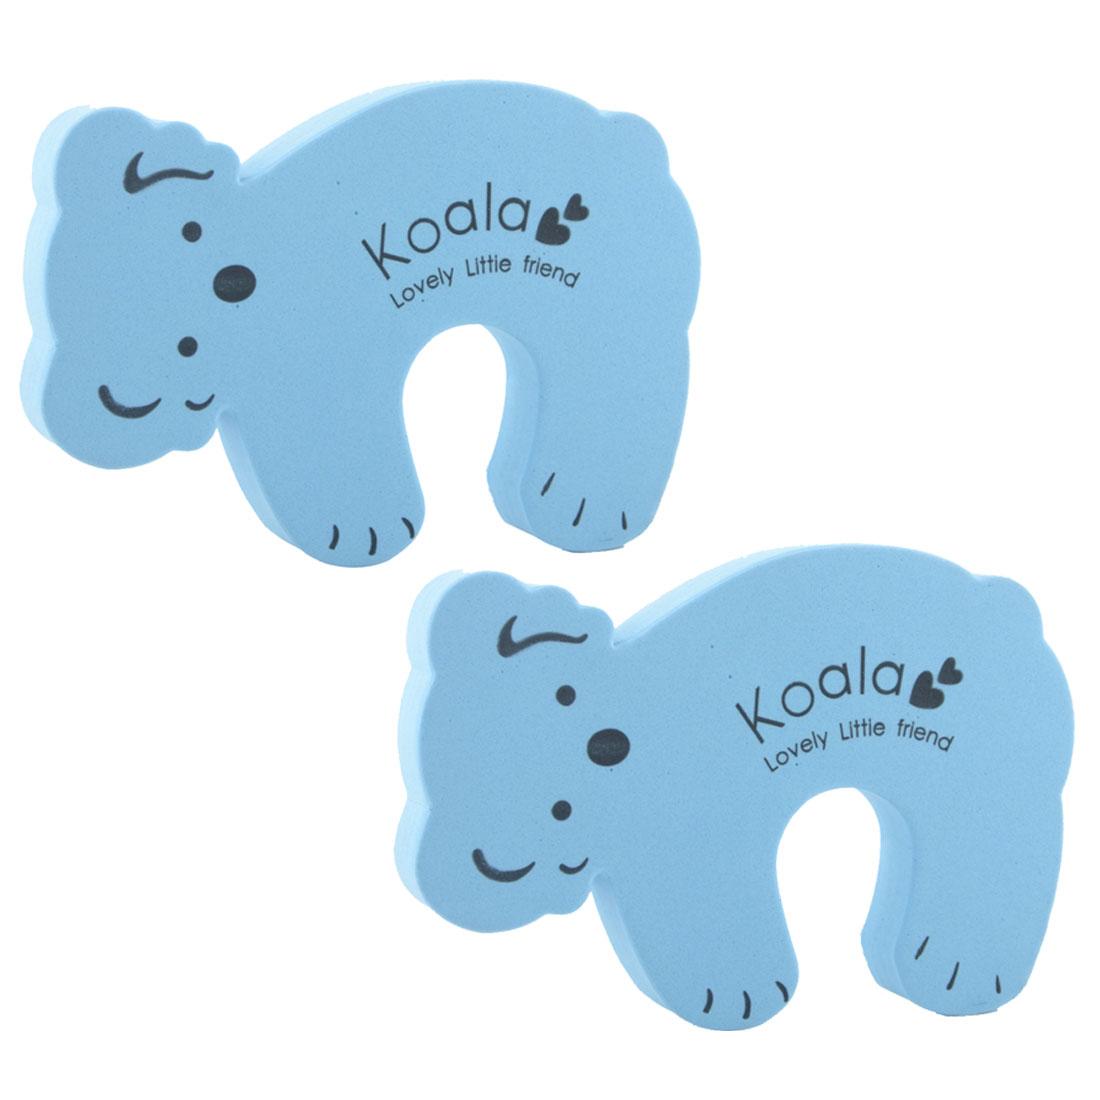 EVA Blue Koala Shape Finger Safety Guard Doorstop Door Stopper Lock Clip Edge 2pcs